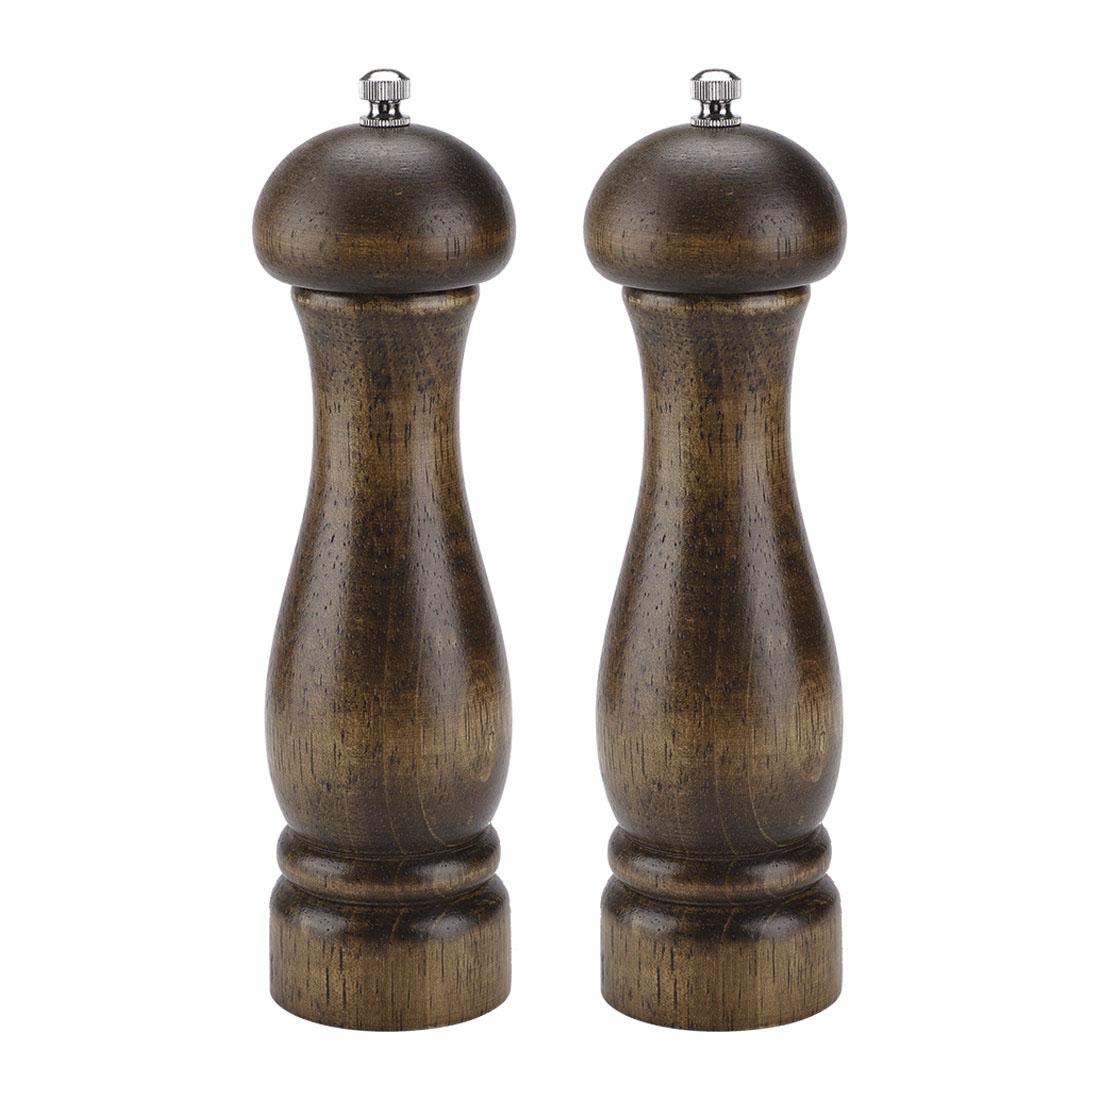 2pcs 8.3 Inch Wooden Salt and Pepper Grinder Mills Shakers Adjustable Coarseness